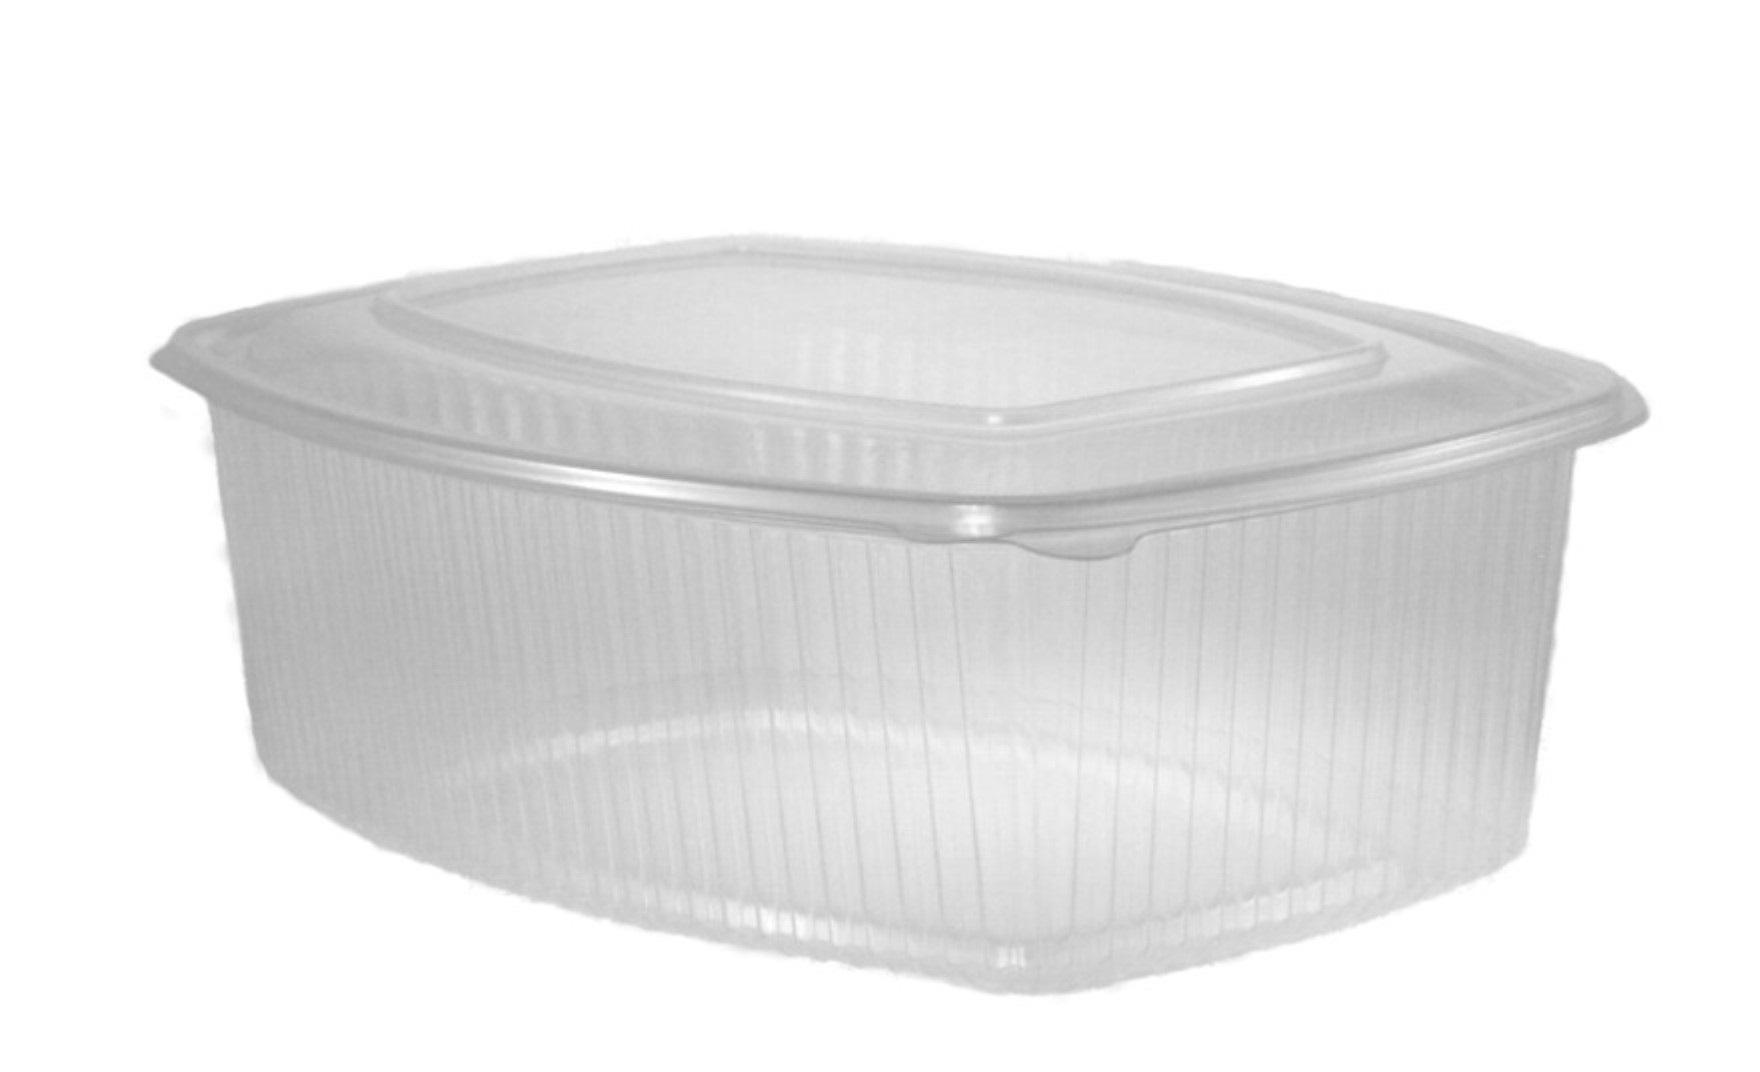 Envase bisagra oval 2000ml 200 unidades